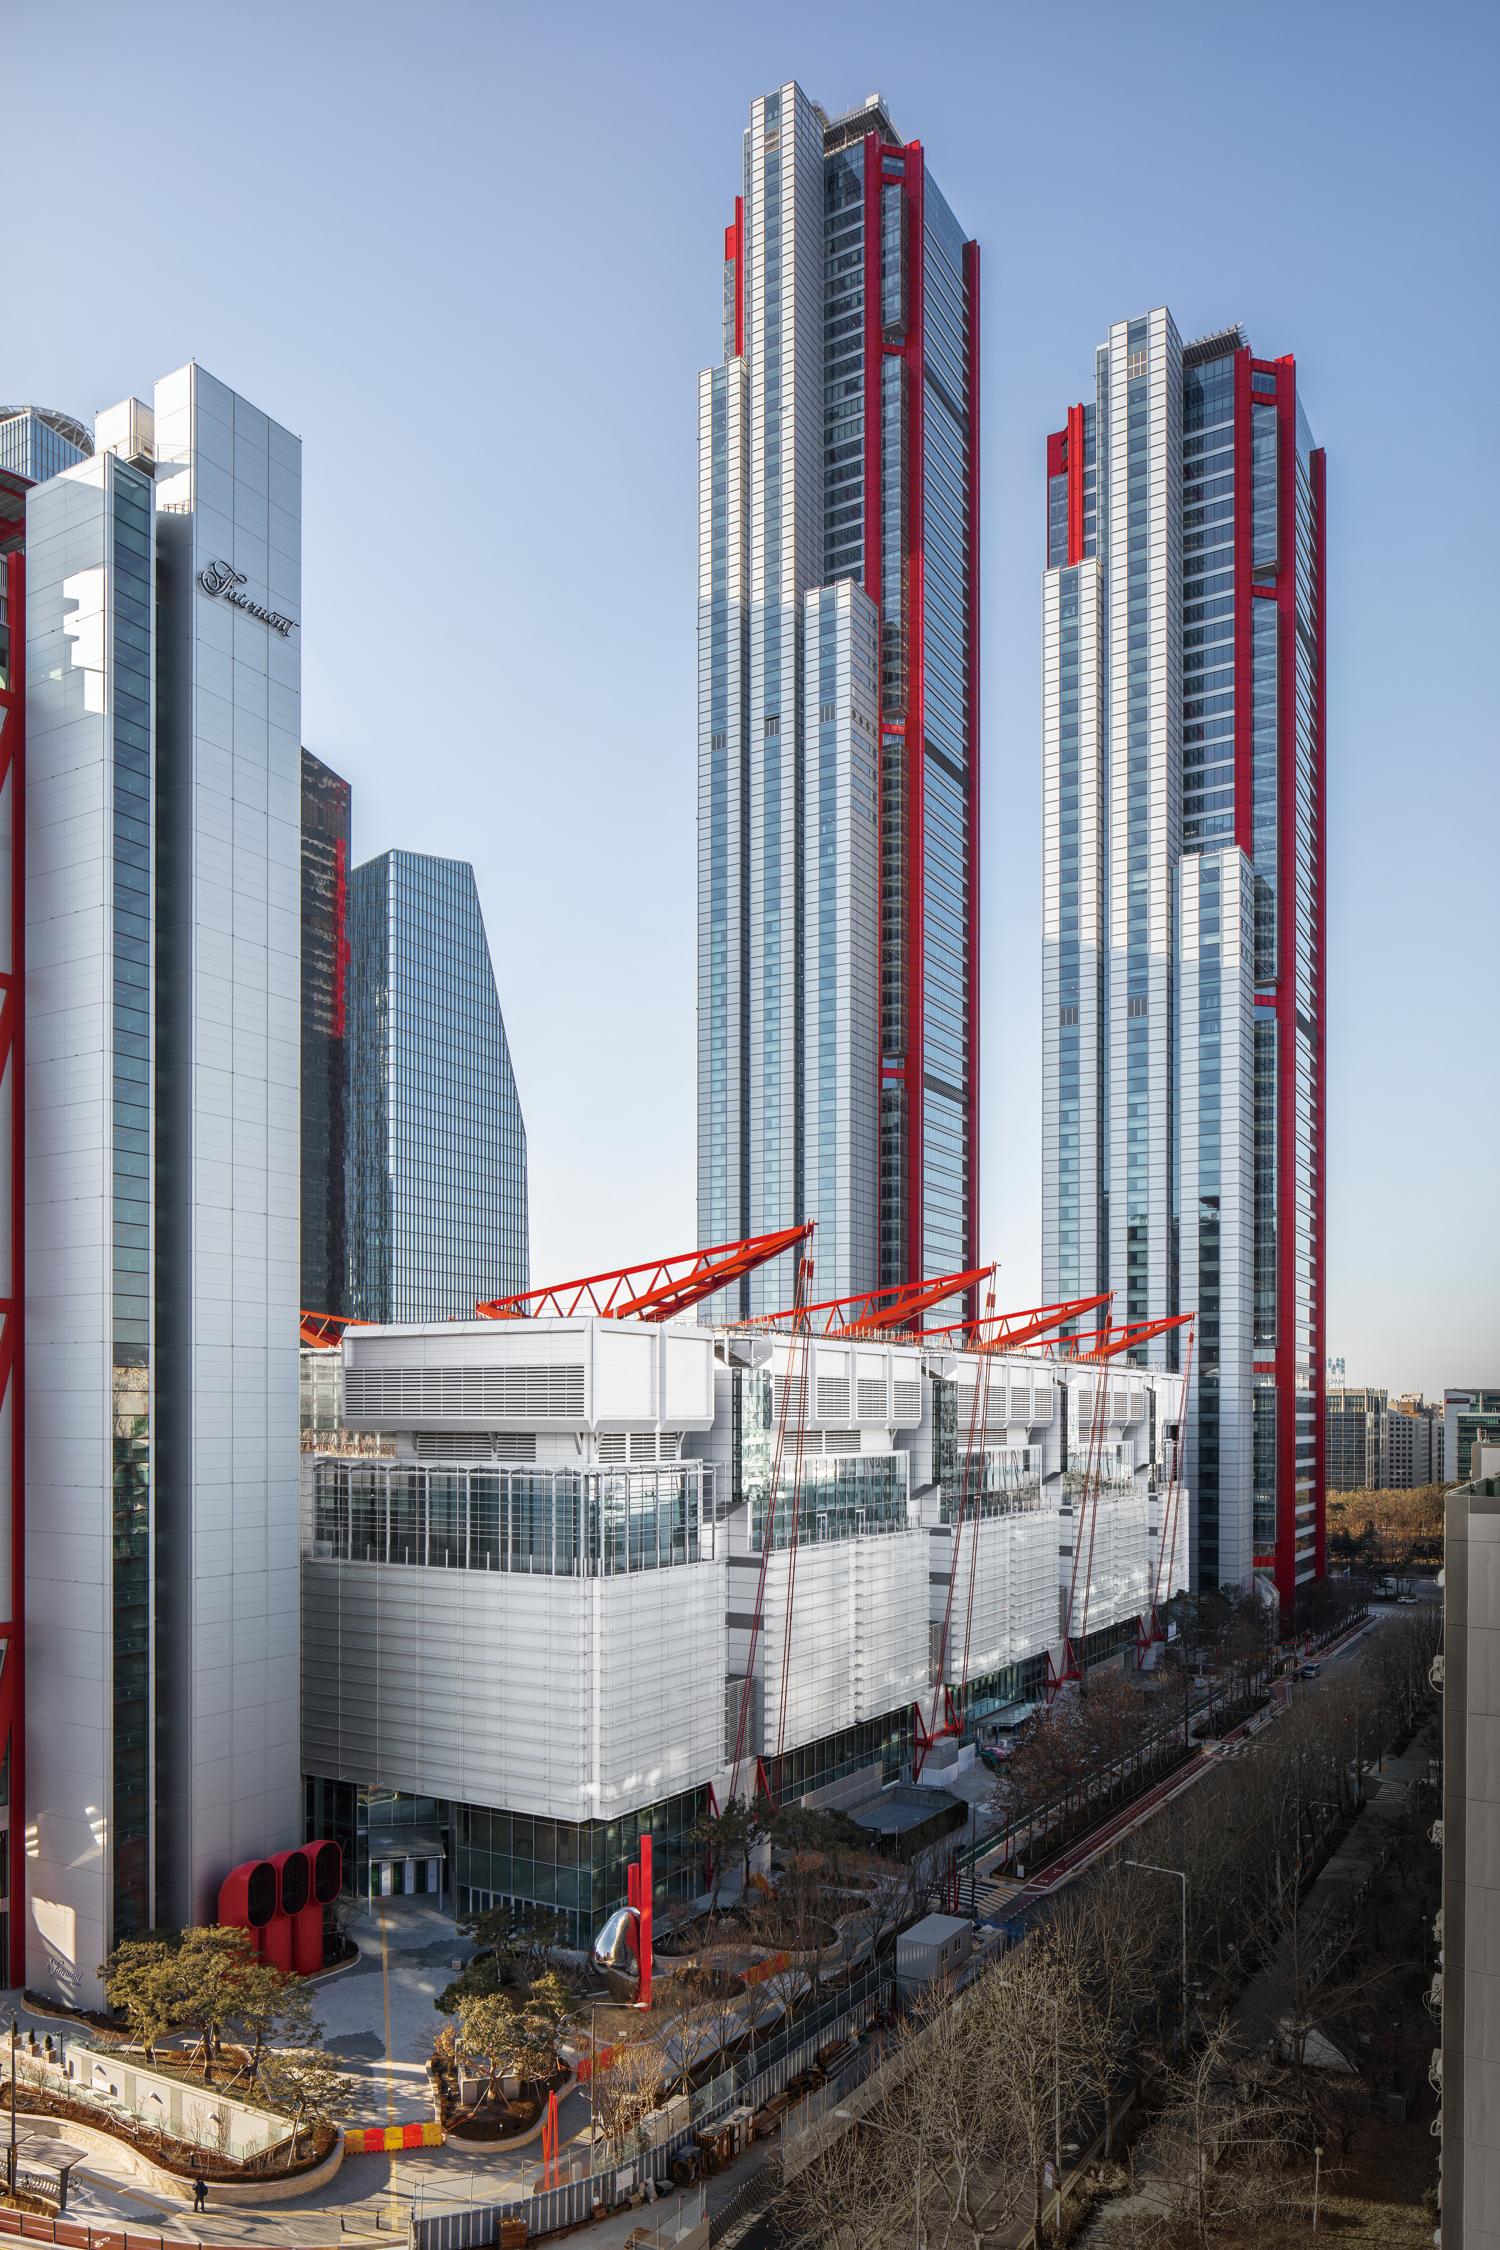 Seoul: The Hyundai Seoul department store opening